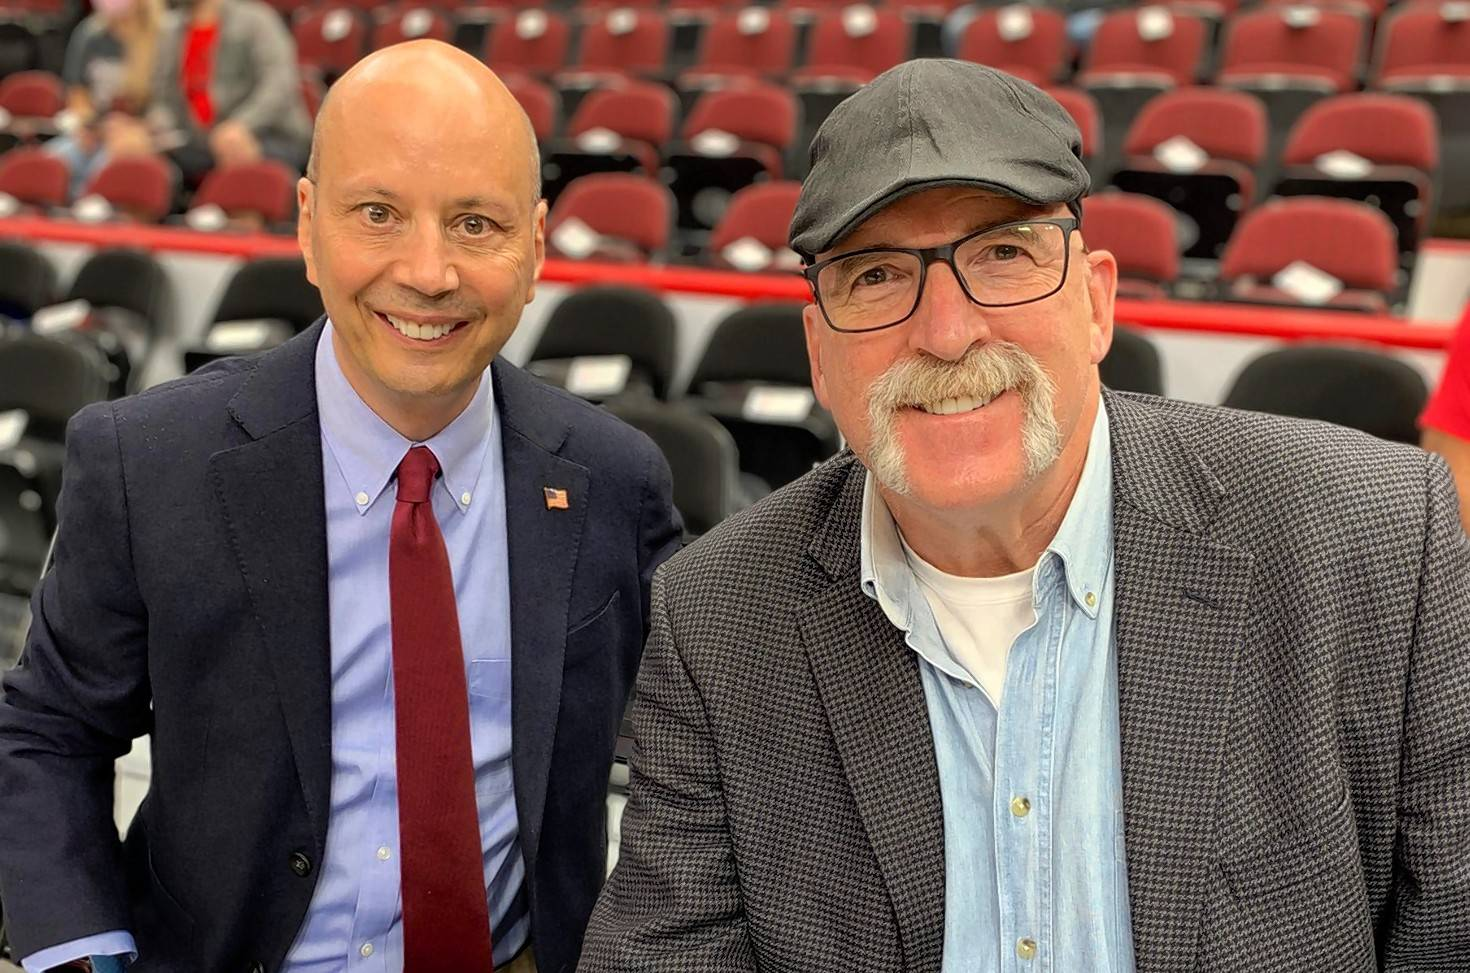 dailyherald.com - Robert Feder - Feder: Chicago Bulls sign multiyear radio renewal with The Score